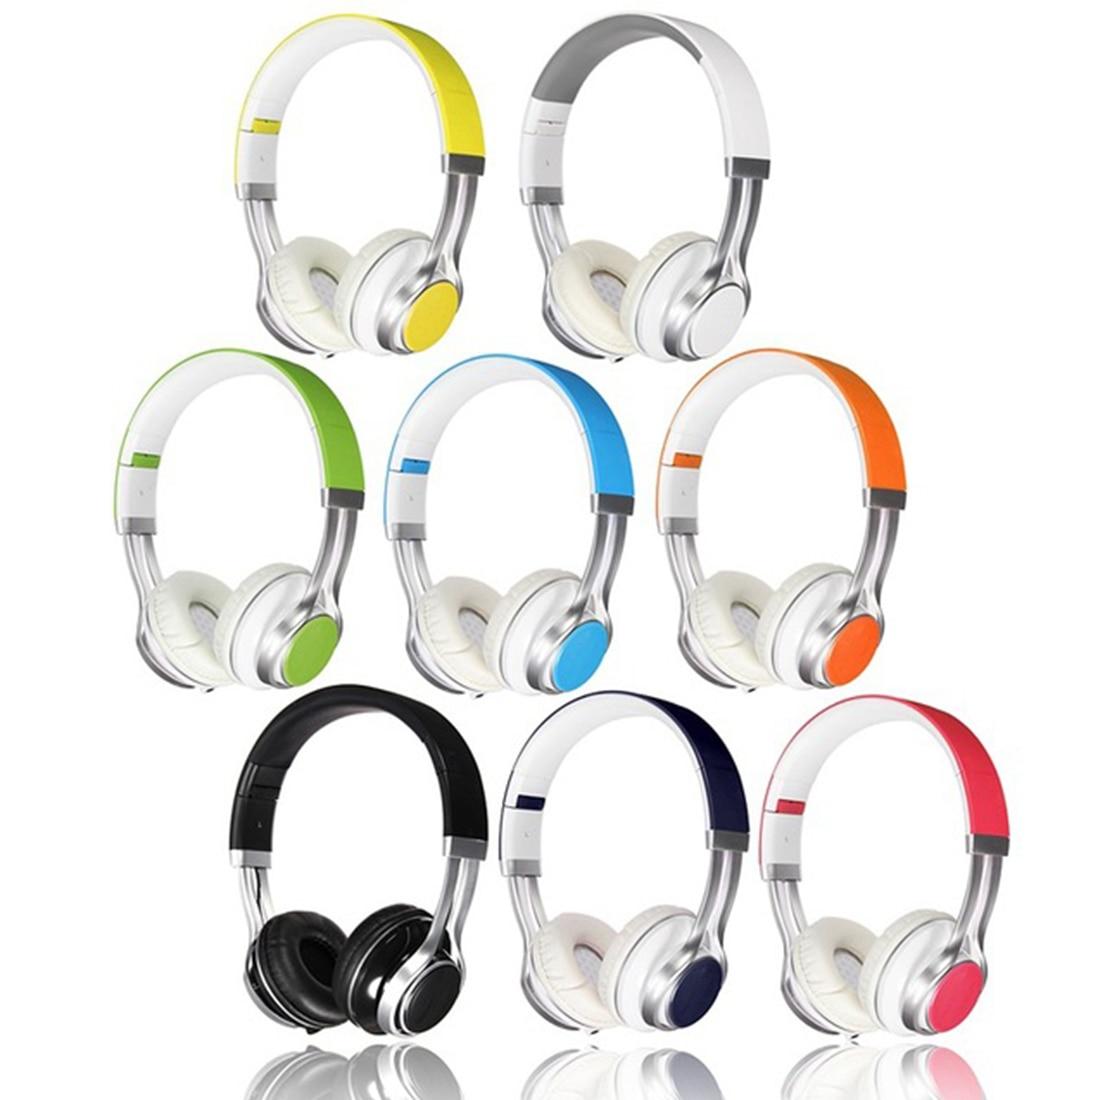 Marsnaska  New Stylish Best Headphones Fold Stereo Surround 3.5mm Headband Headset For Samsung For HTC With Microphone marsnaska brand new white